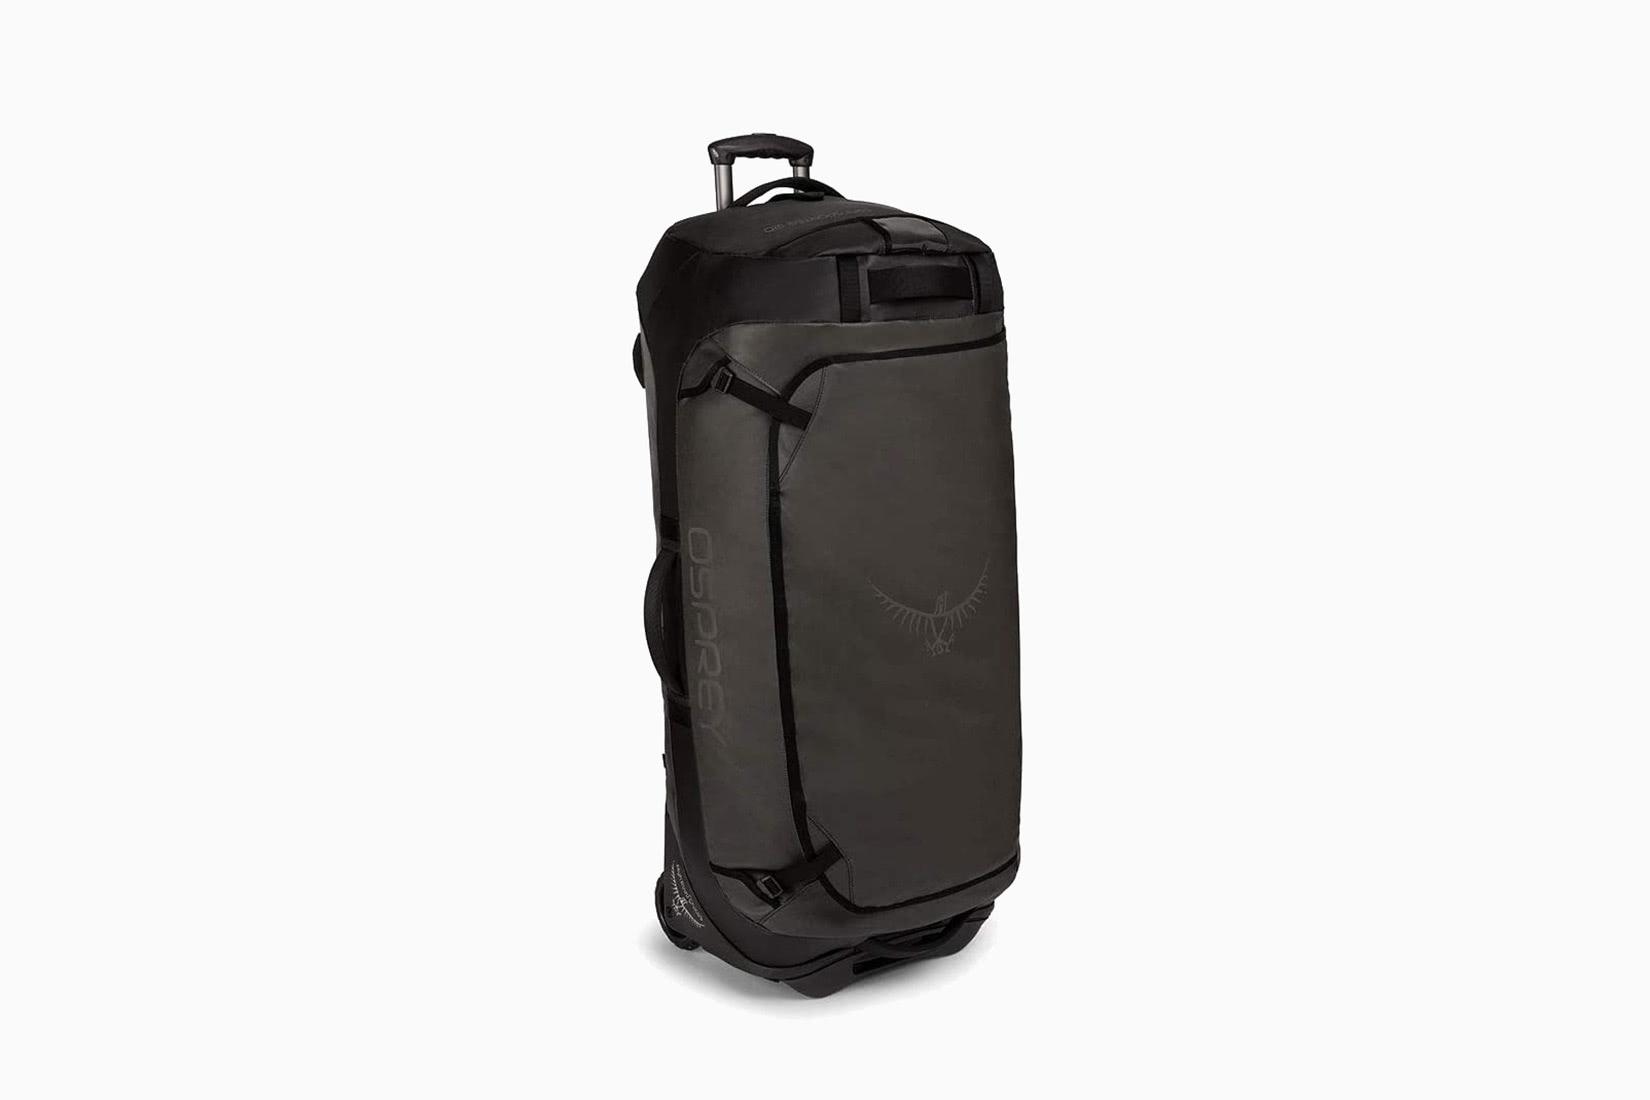 best luggage brands suitcase duffel Osprey - Luxe Digital